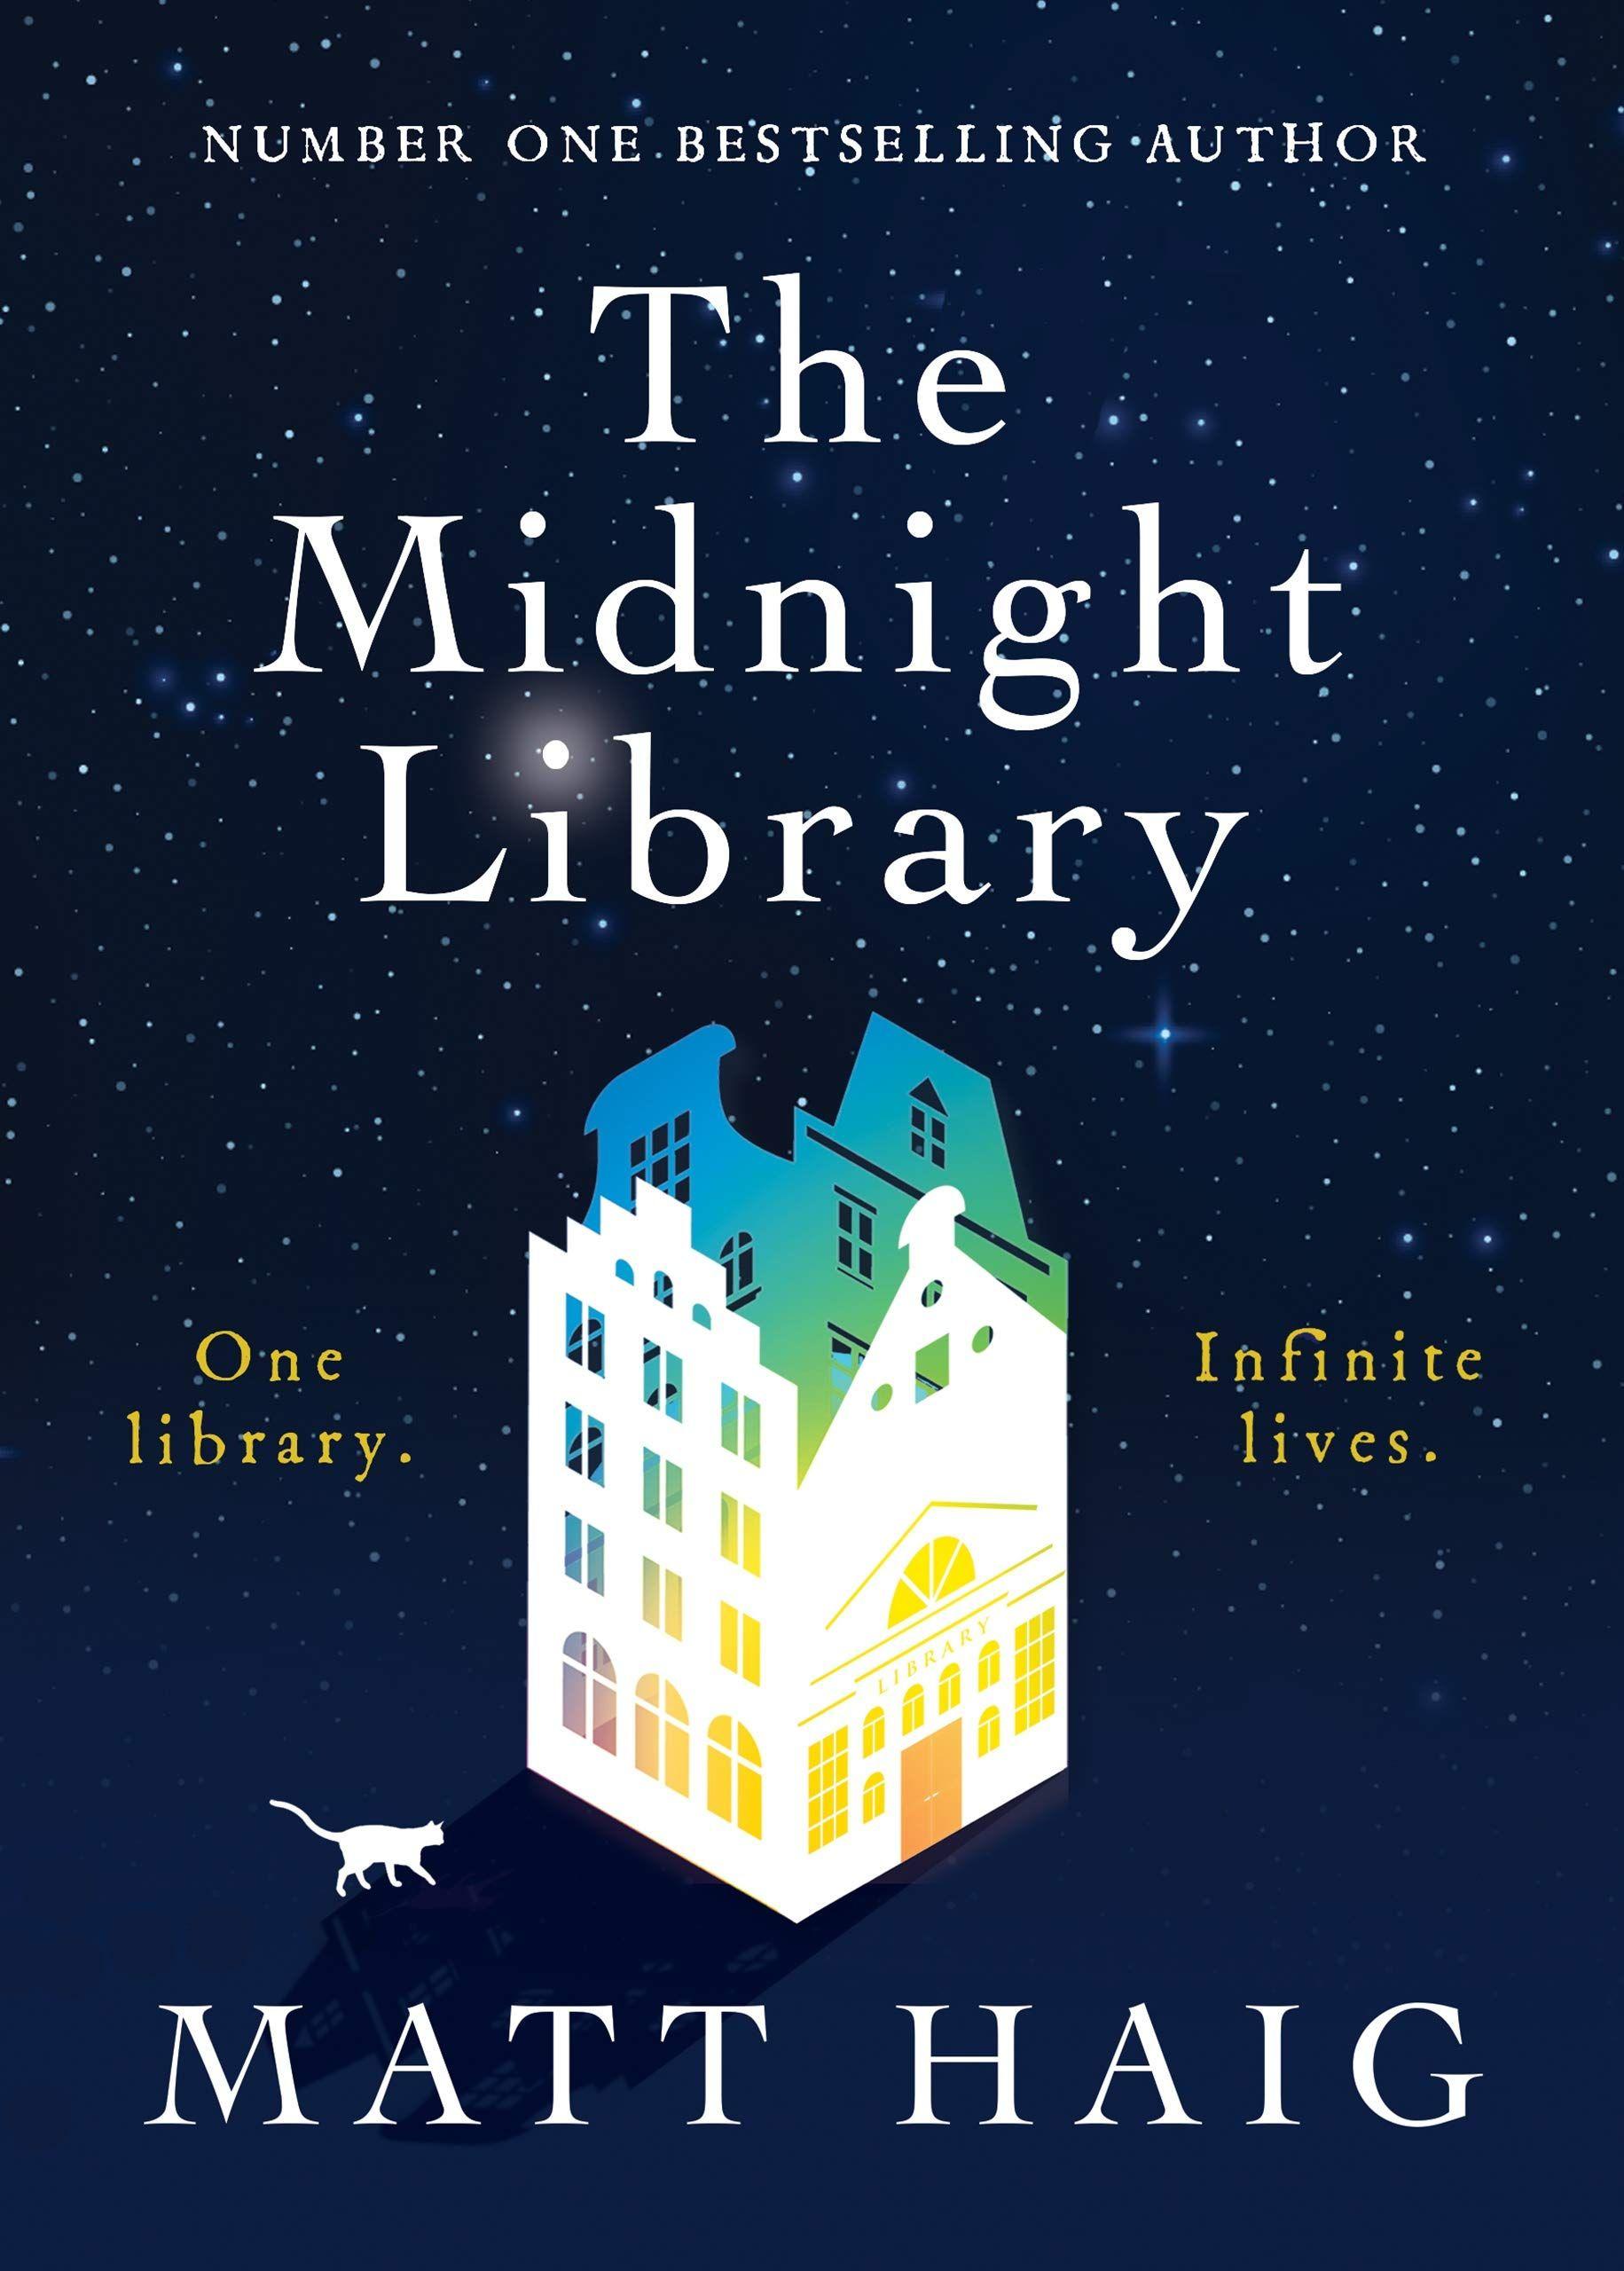 Pdf The Midnight Library By Matt Haig The Midnight Library Best Book Club Books Book Club Books